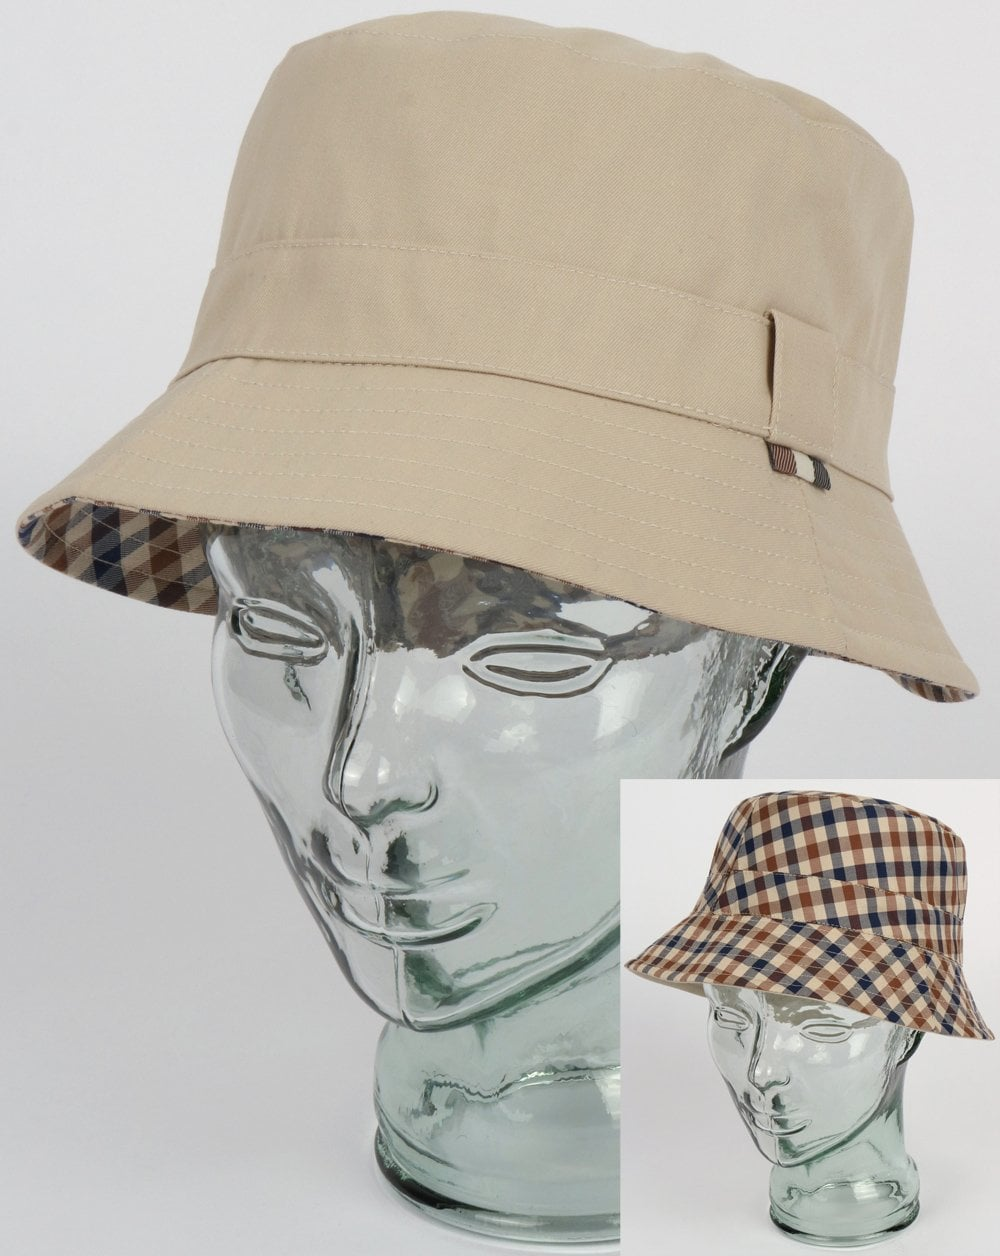 afbc9a5f034 Aquascutum Aquascutum Reversible Bucket Hat Light Beige